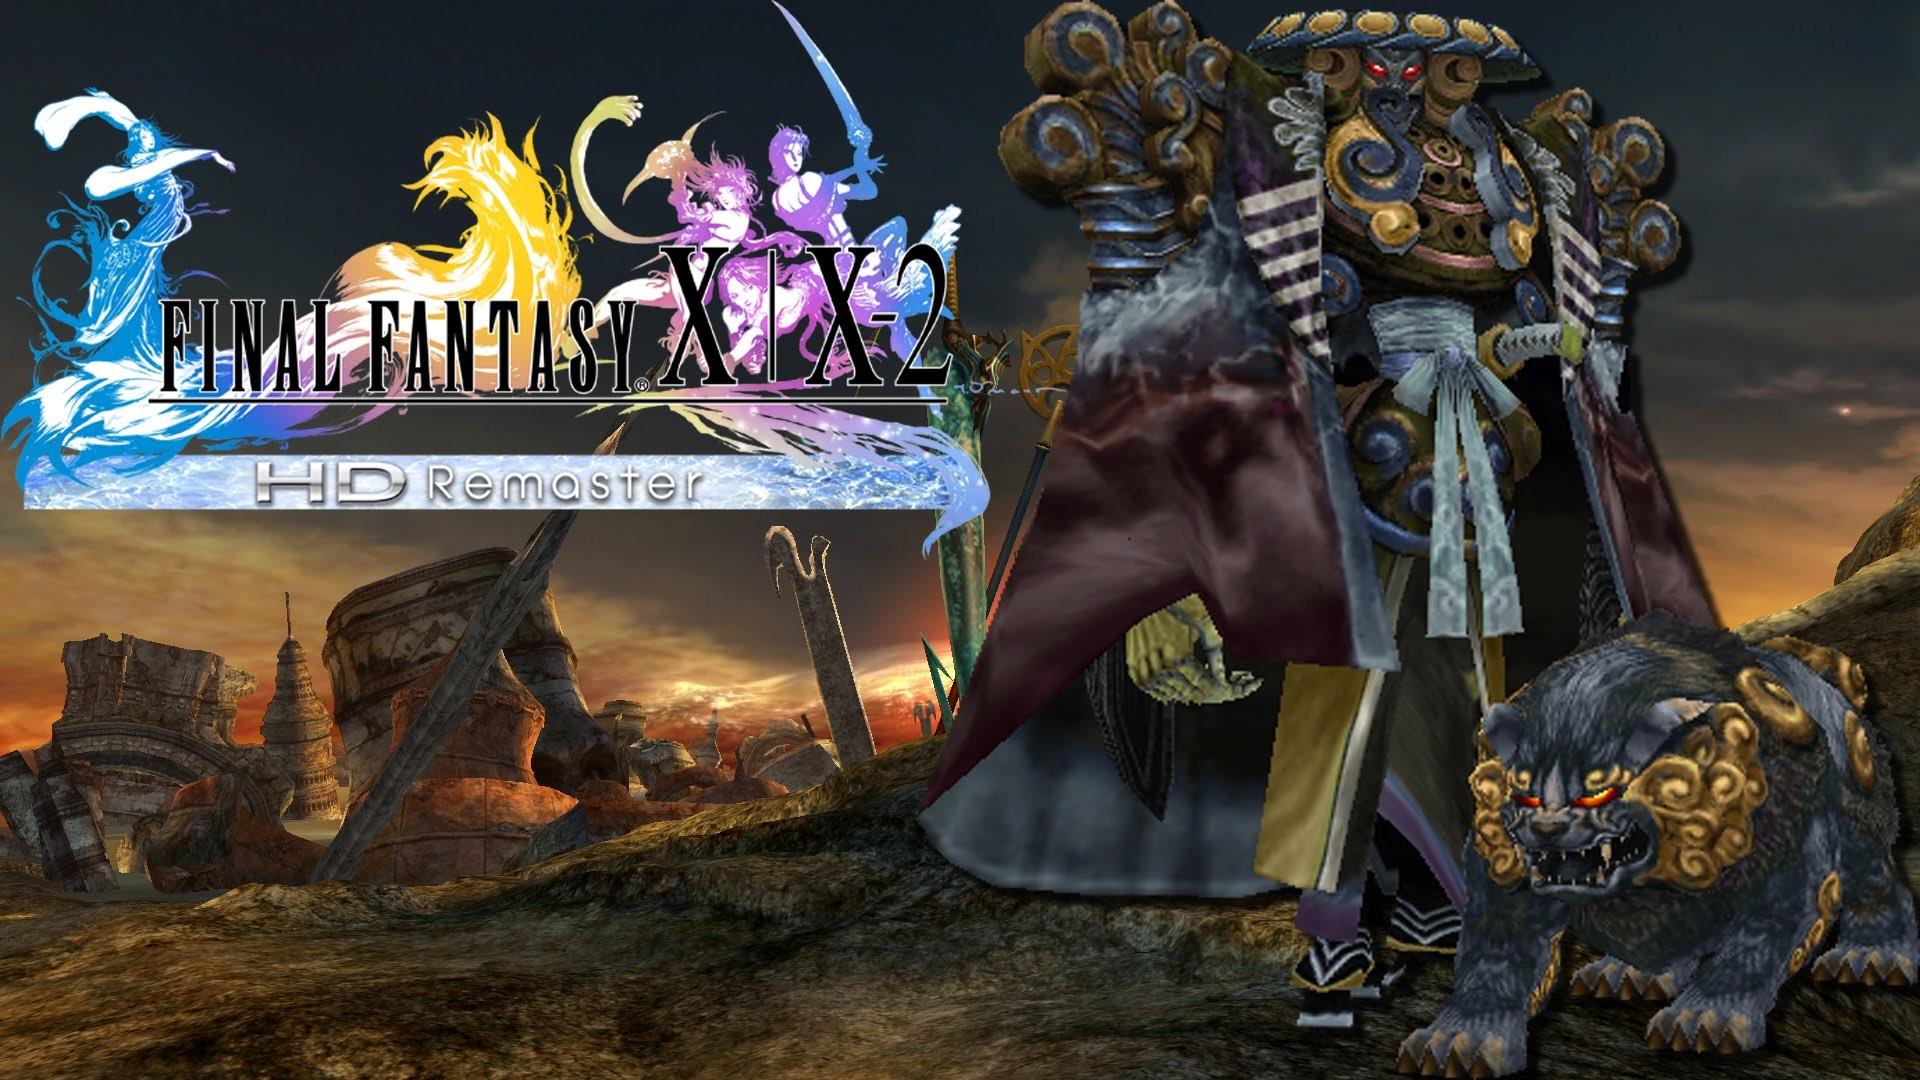 Final Fantasy X HD Remaster РEones oscuros РYojimbo РEspa̱ol РYouTube